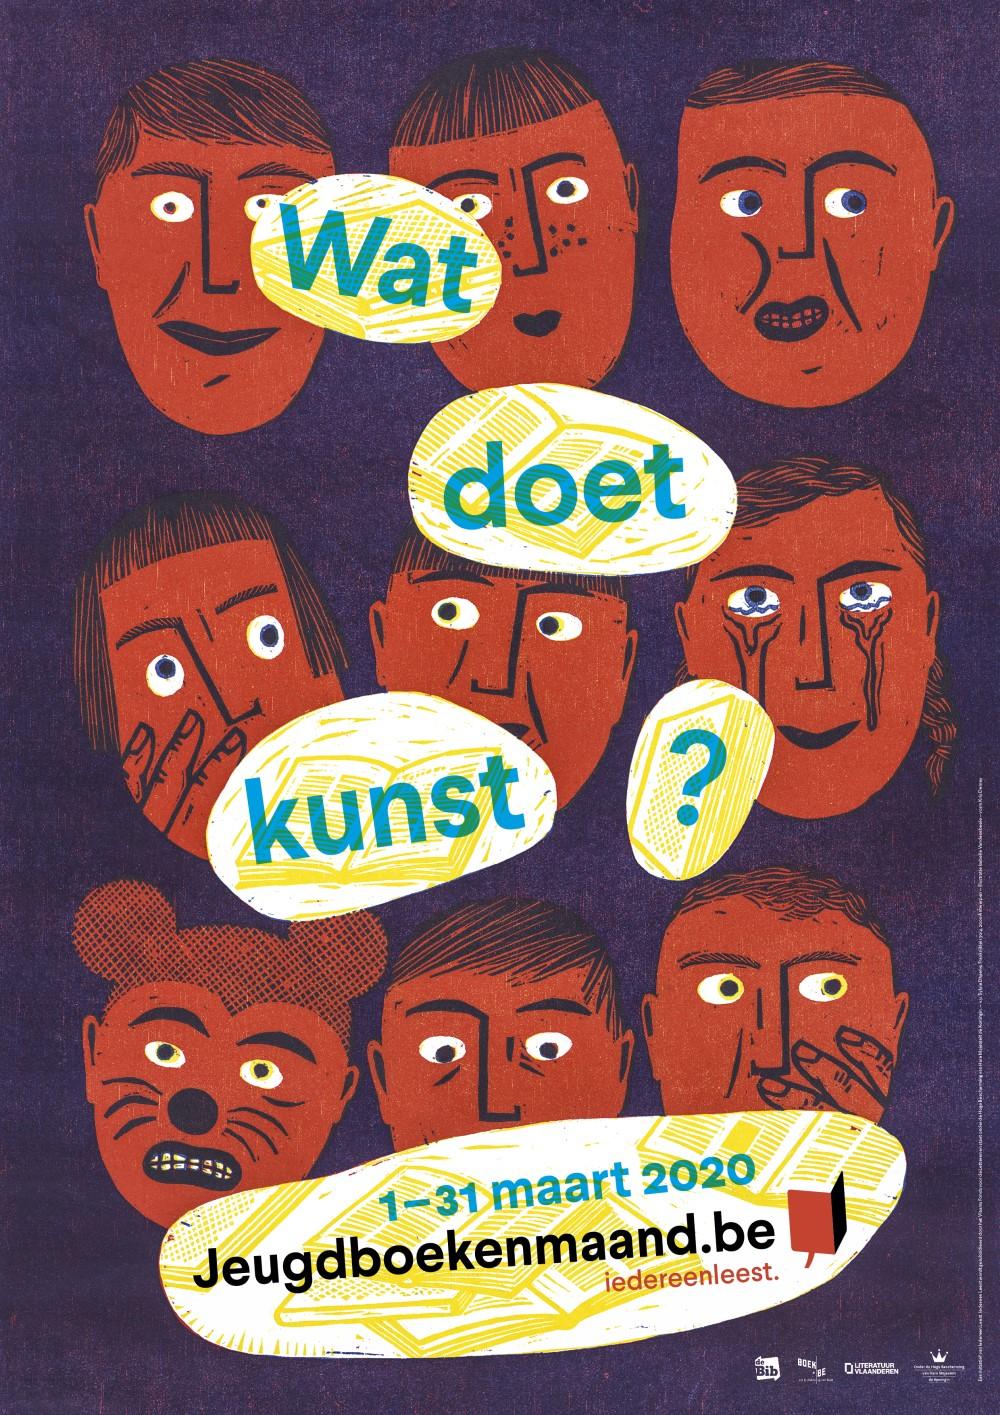 Affiche Jeugdboekenmaand 2020